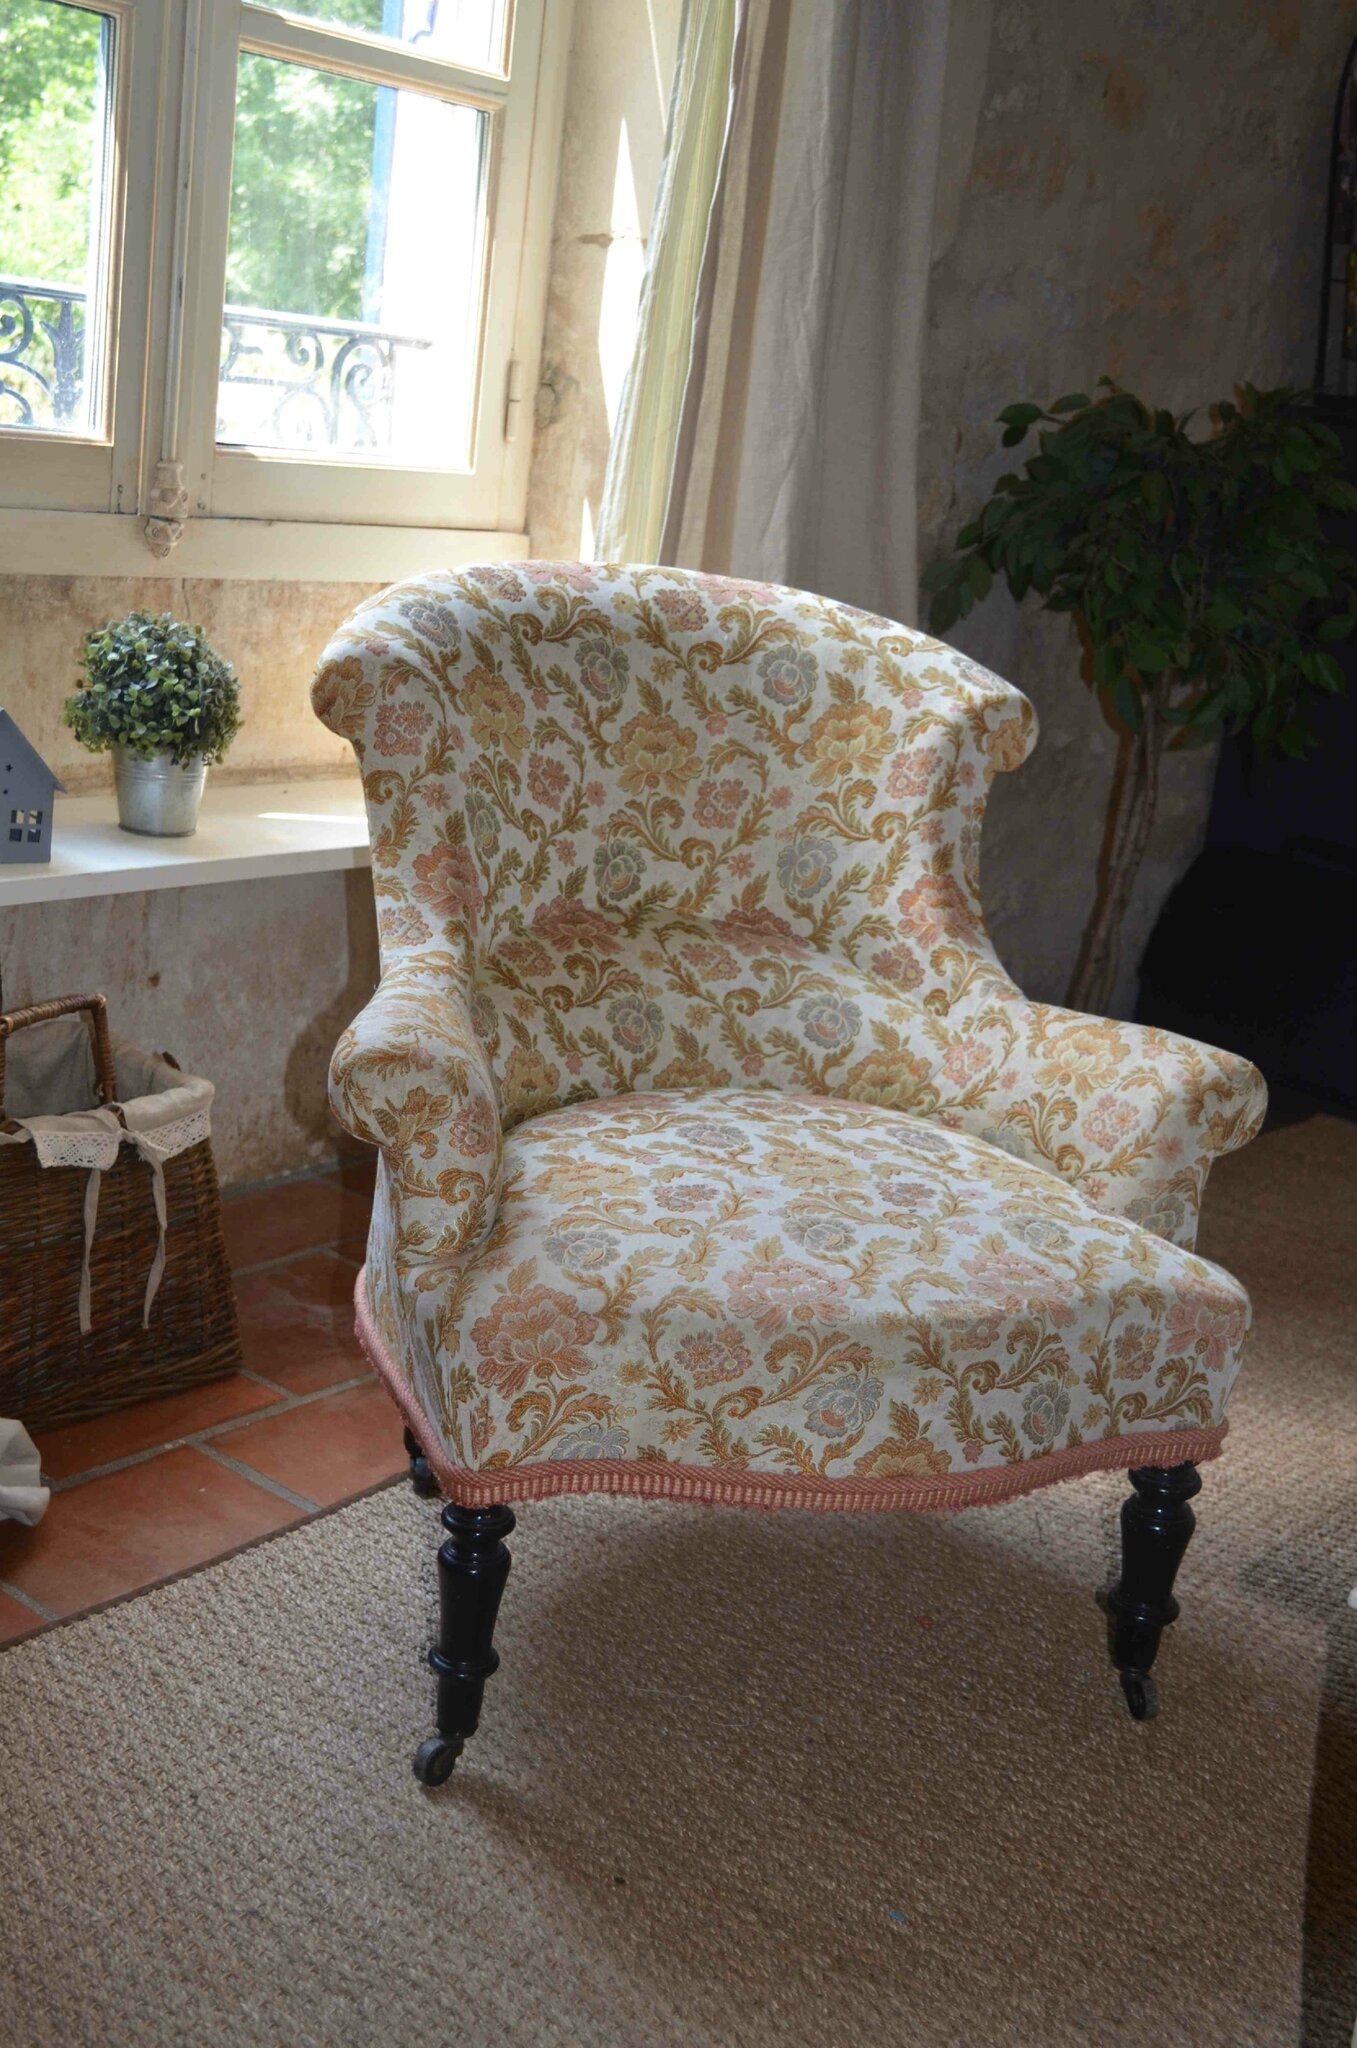 J 39 habille mon fauteuil little something - Housse fauteuil crapaud ...